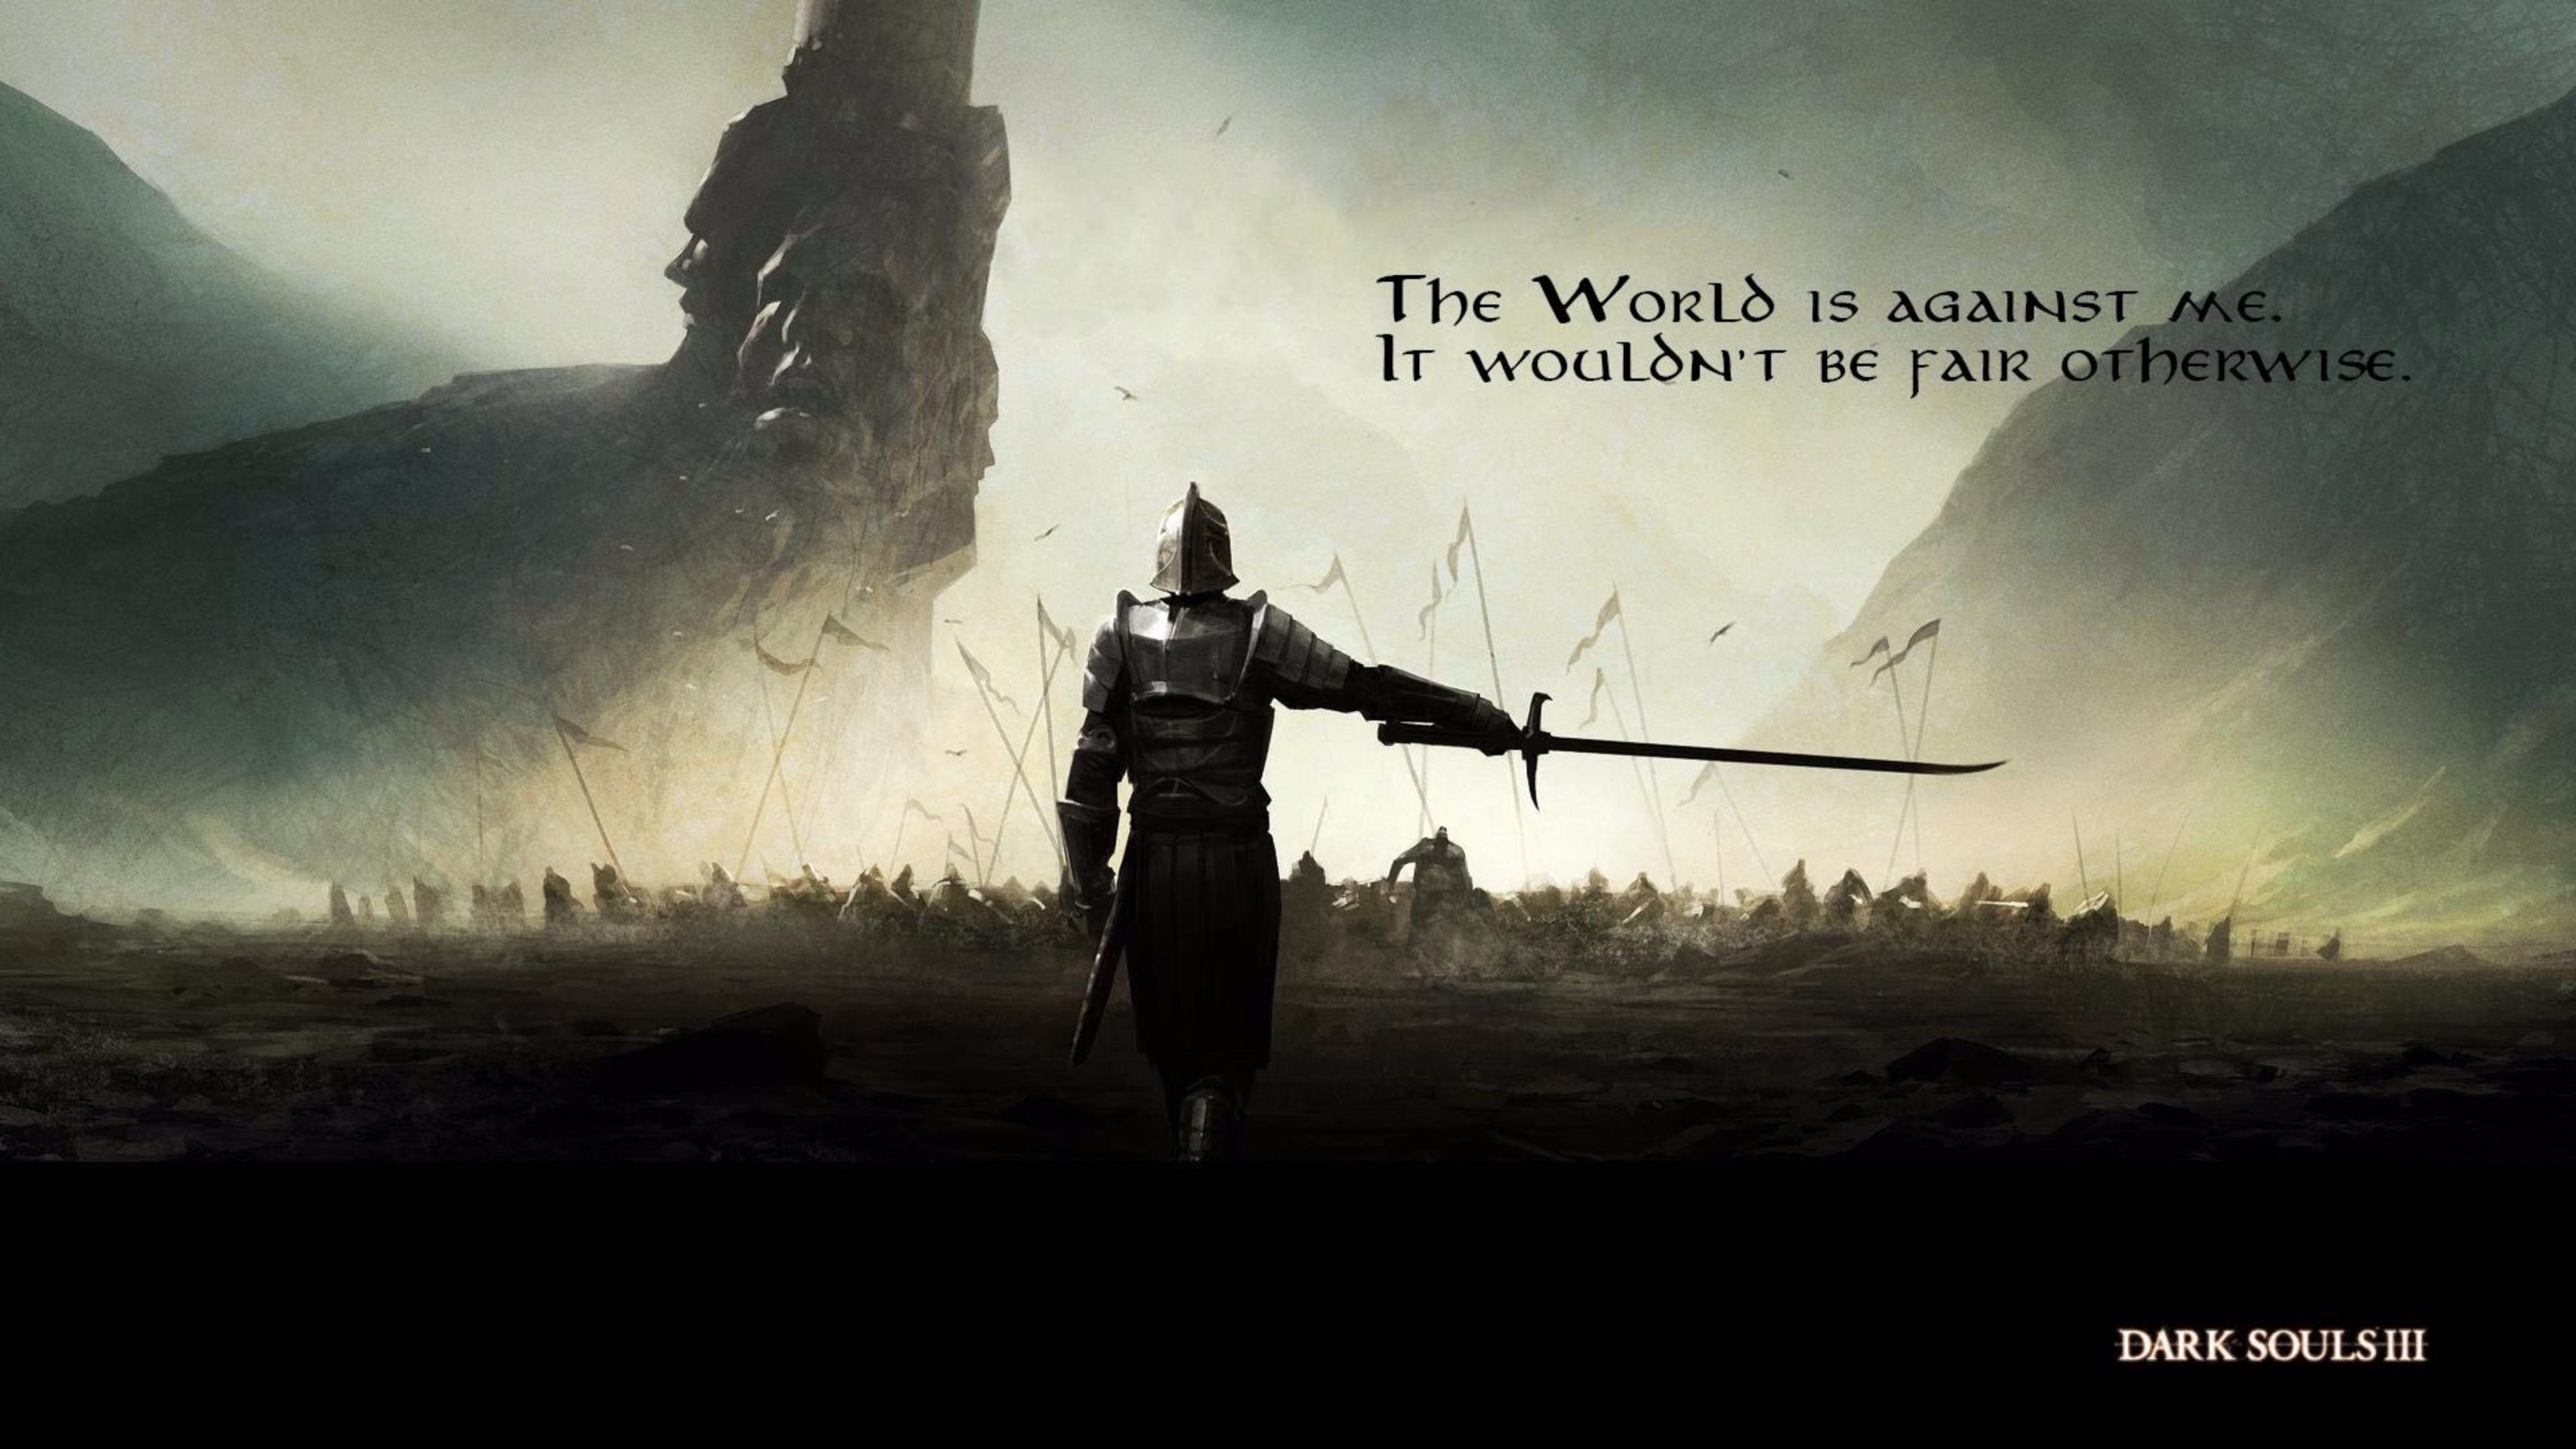 Quotes 2016 Dark Souls 3 4K Wallpapers   Free 4K Wallpaper